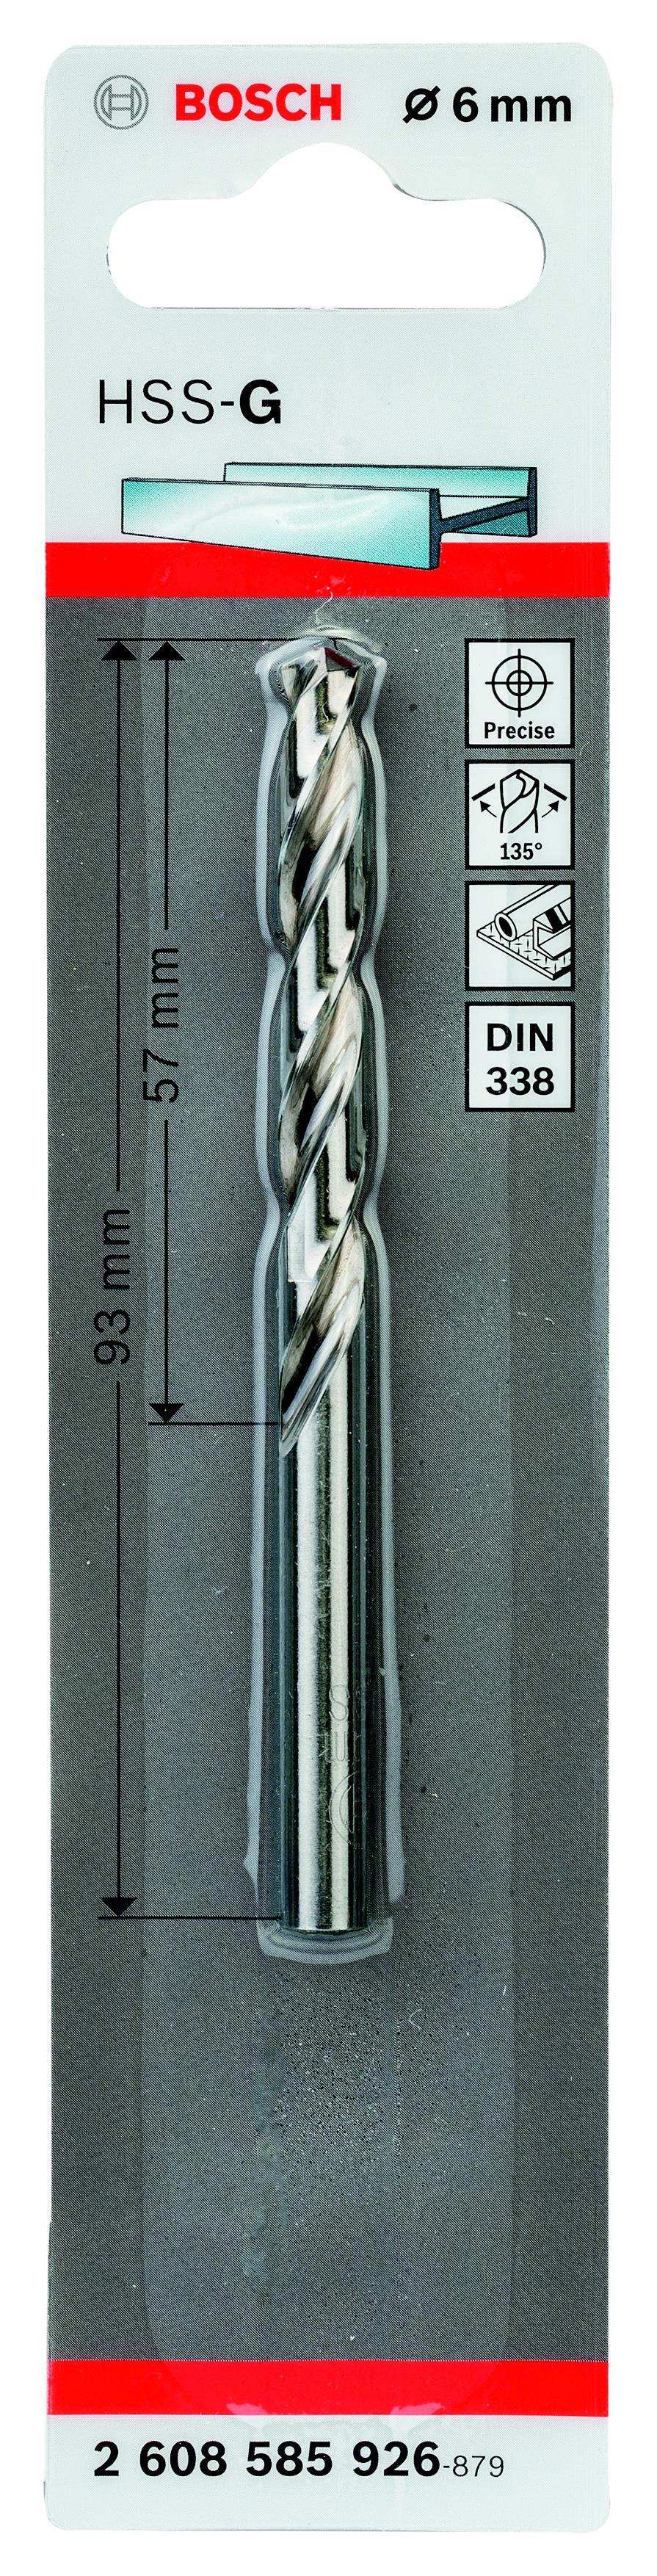 Сверло по металлу Bosch Hss-g standardline 6.0 мм (2.608.585.926) пила дисковая bosch gks 55 g 601682000